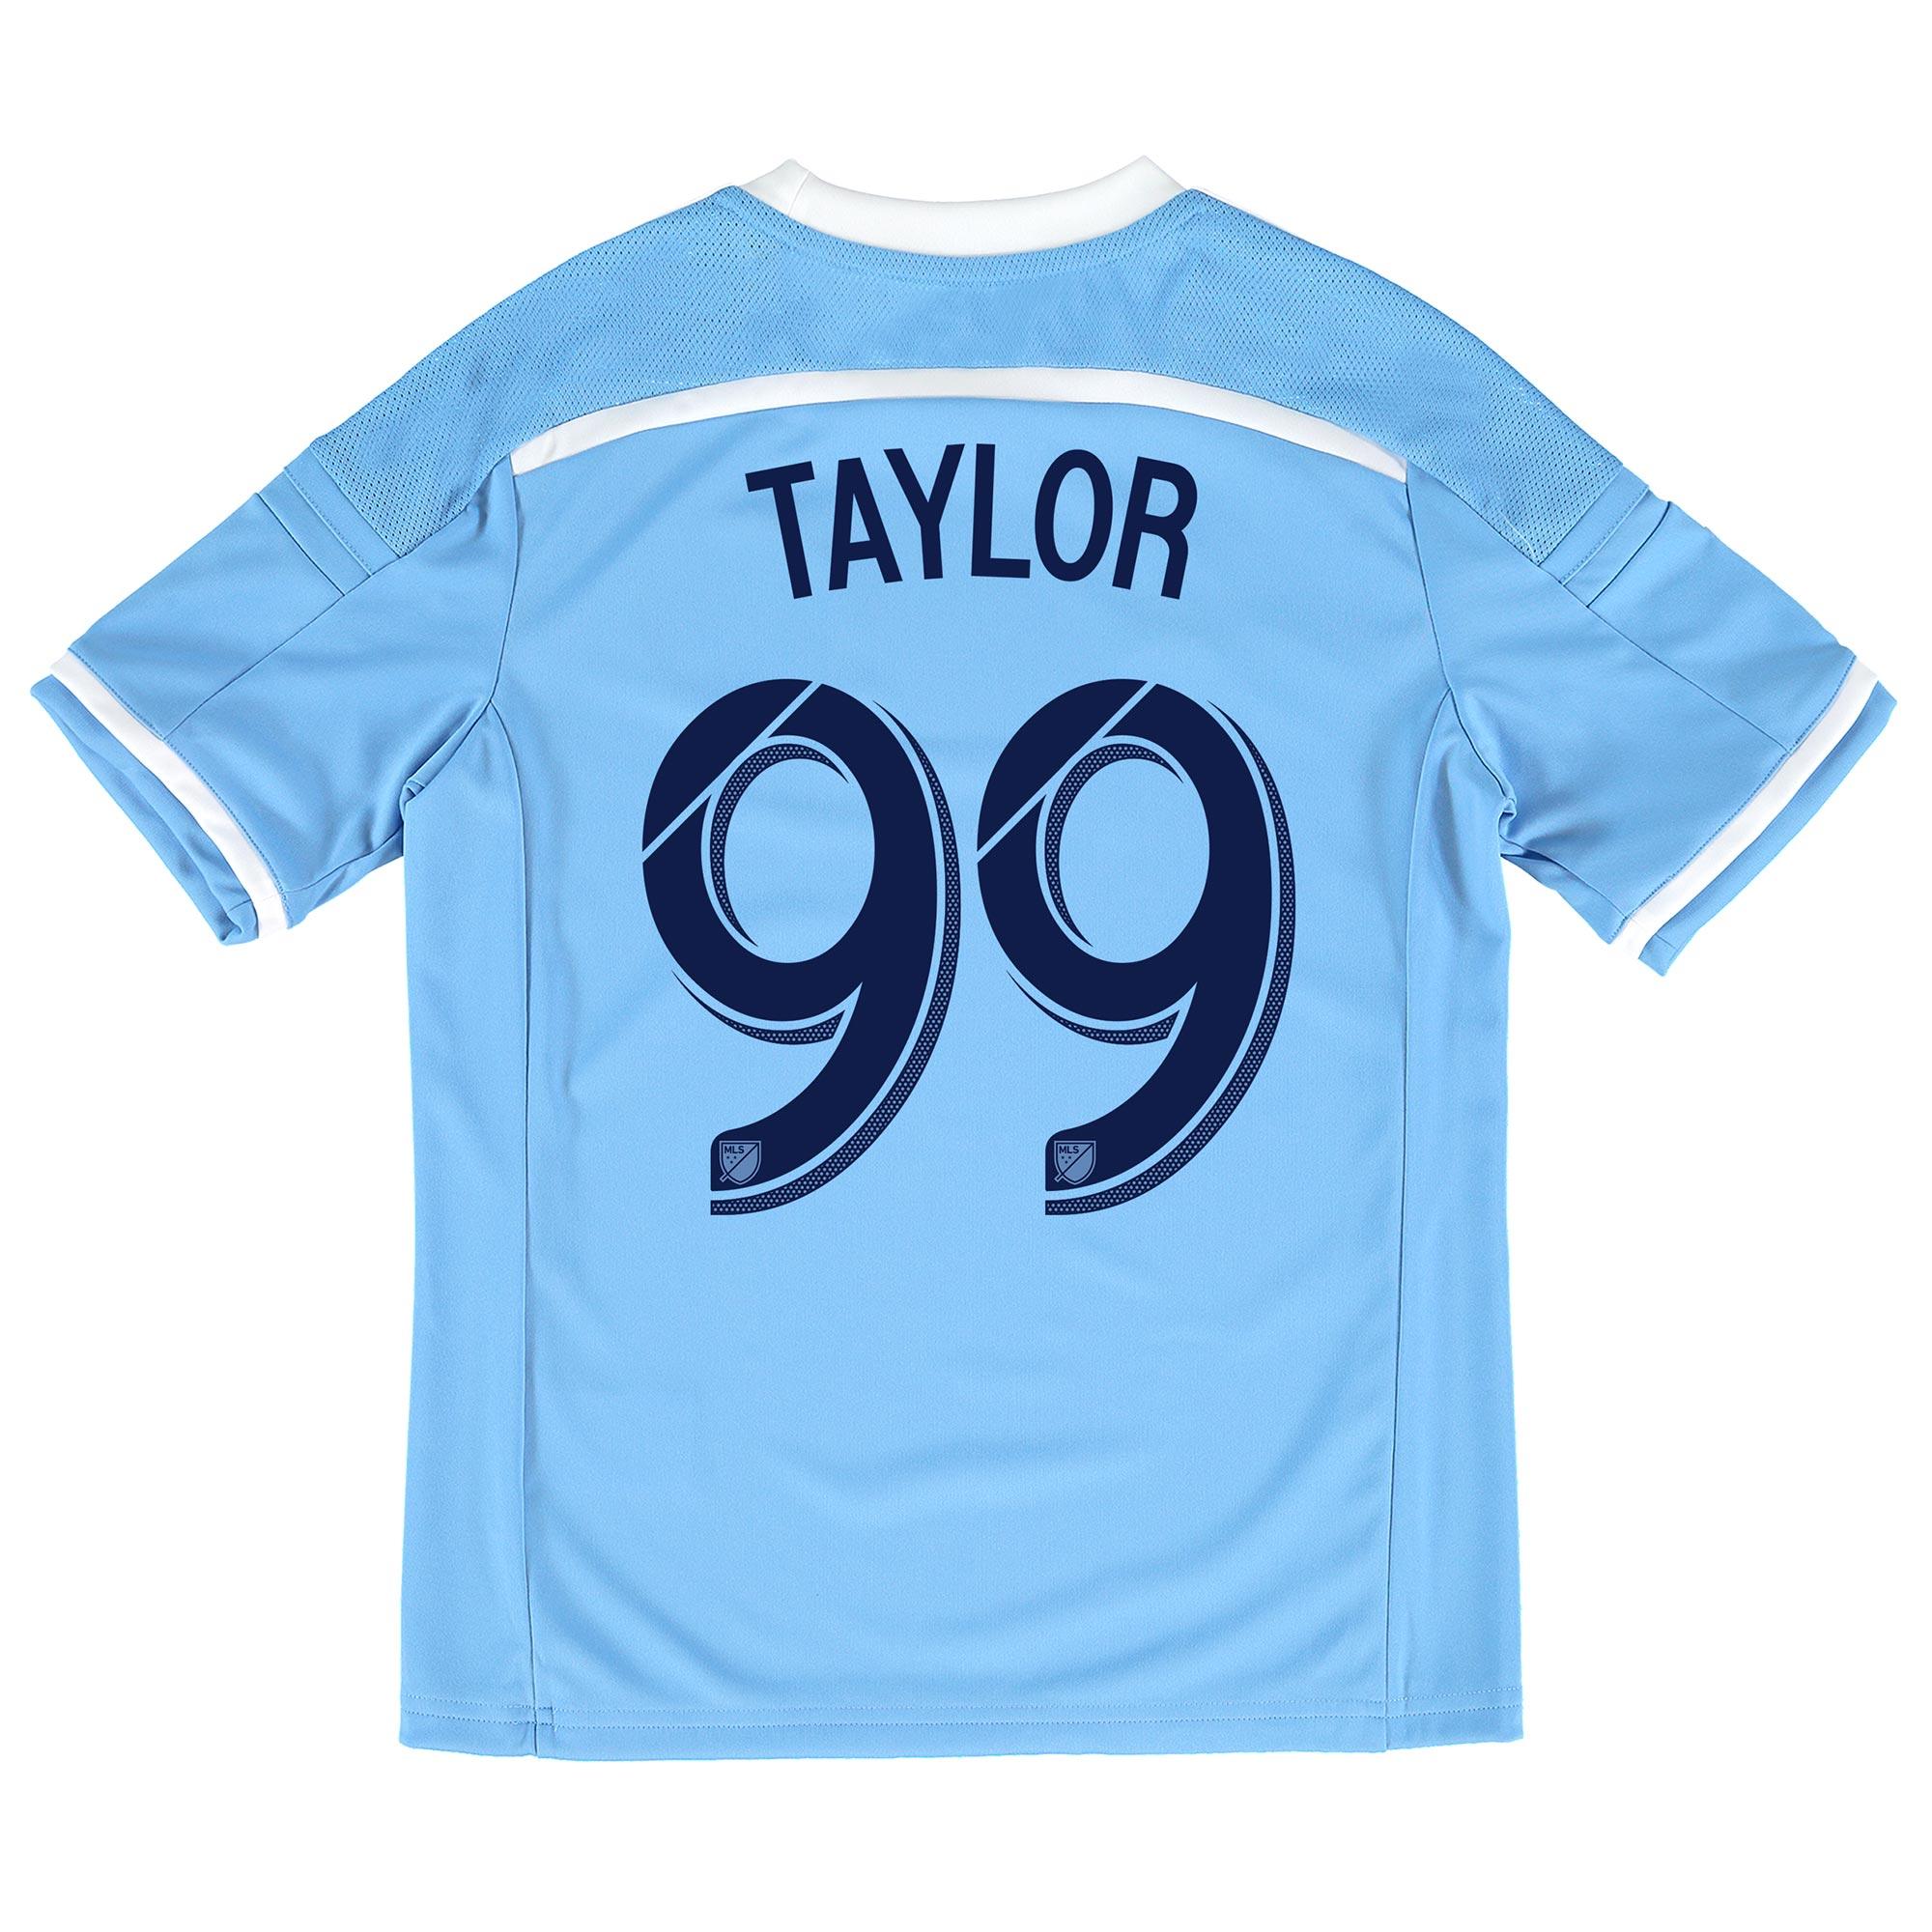 New York City FC Home Shirt 2015-16 - Kids with Taylor 99 printing